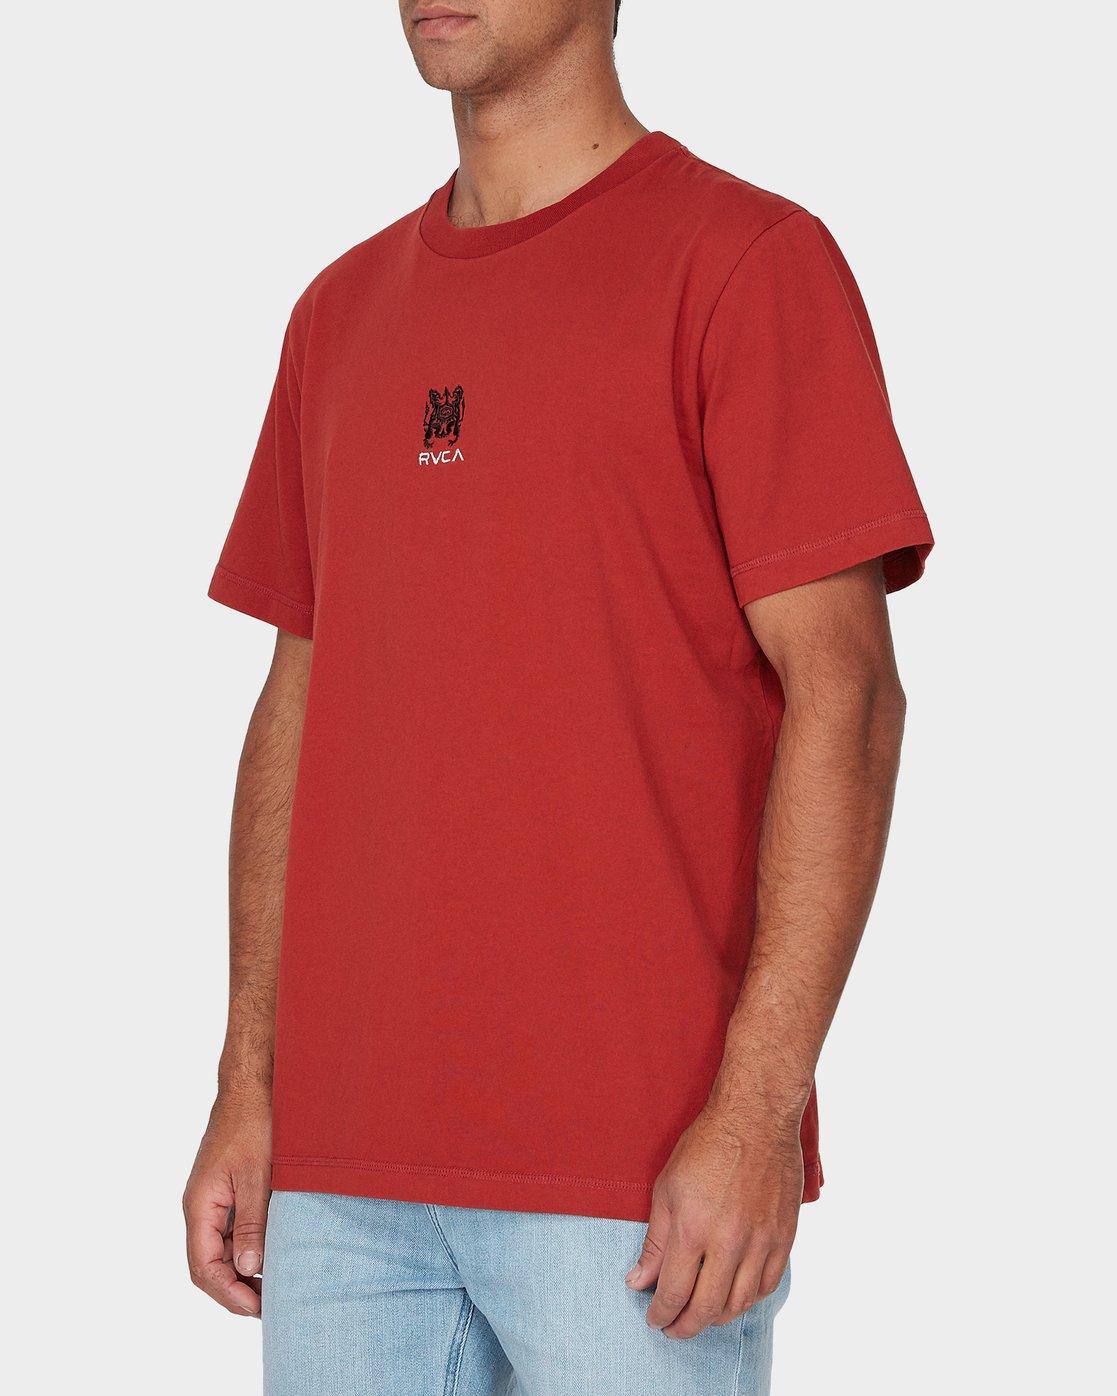 1 RVCA Crest Short Sleeve T-Shirt Red R193055 RVCA